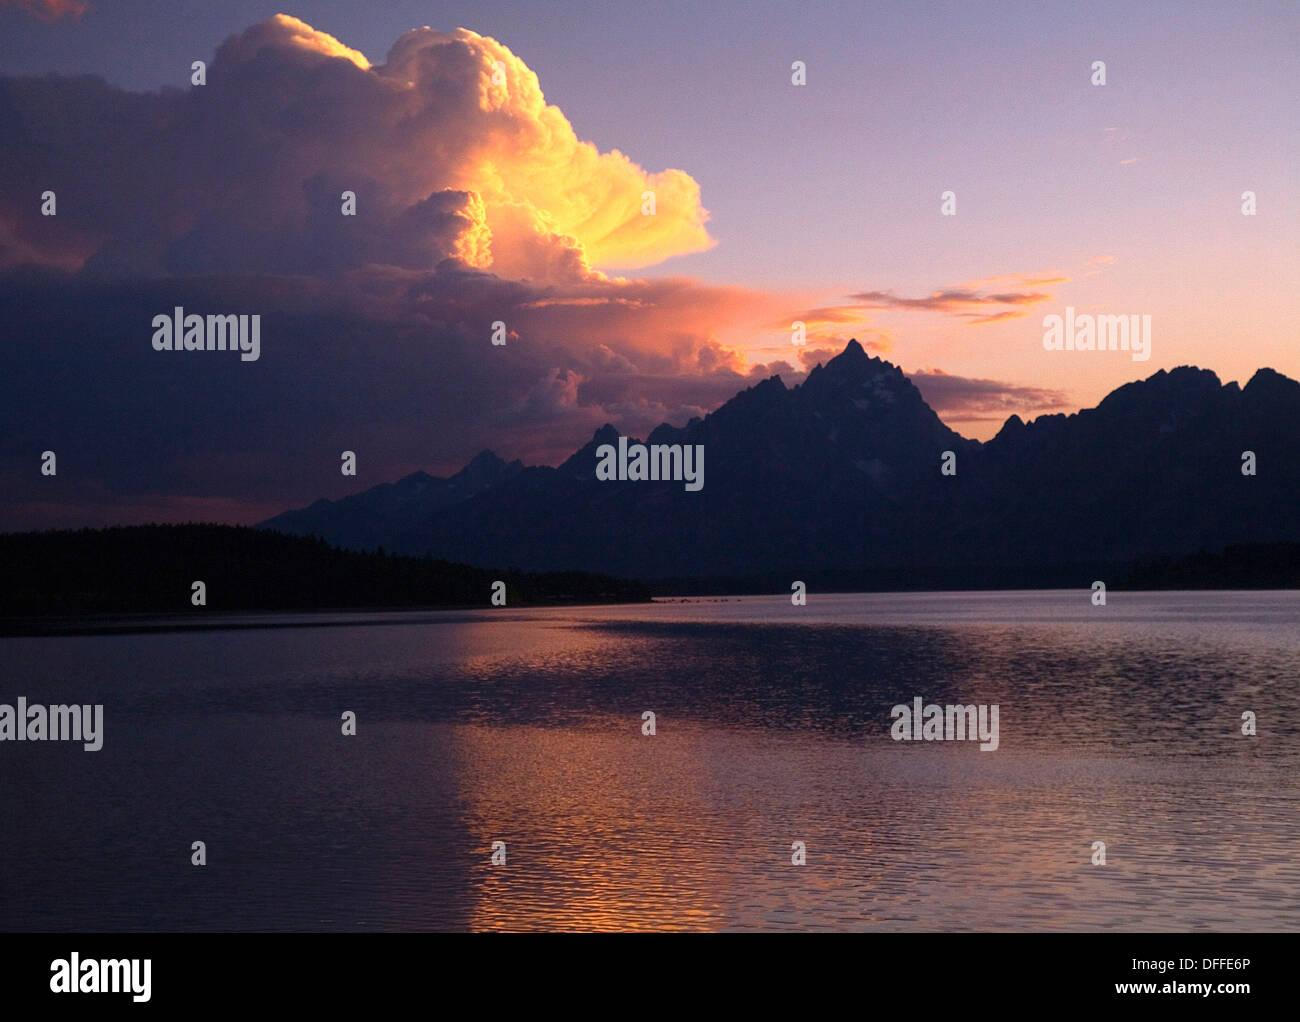 The setting sun shines over The Tetons Mountain Range and Jackson Lake at Grand Teton National Park, Wyoming - Stock Image